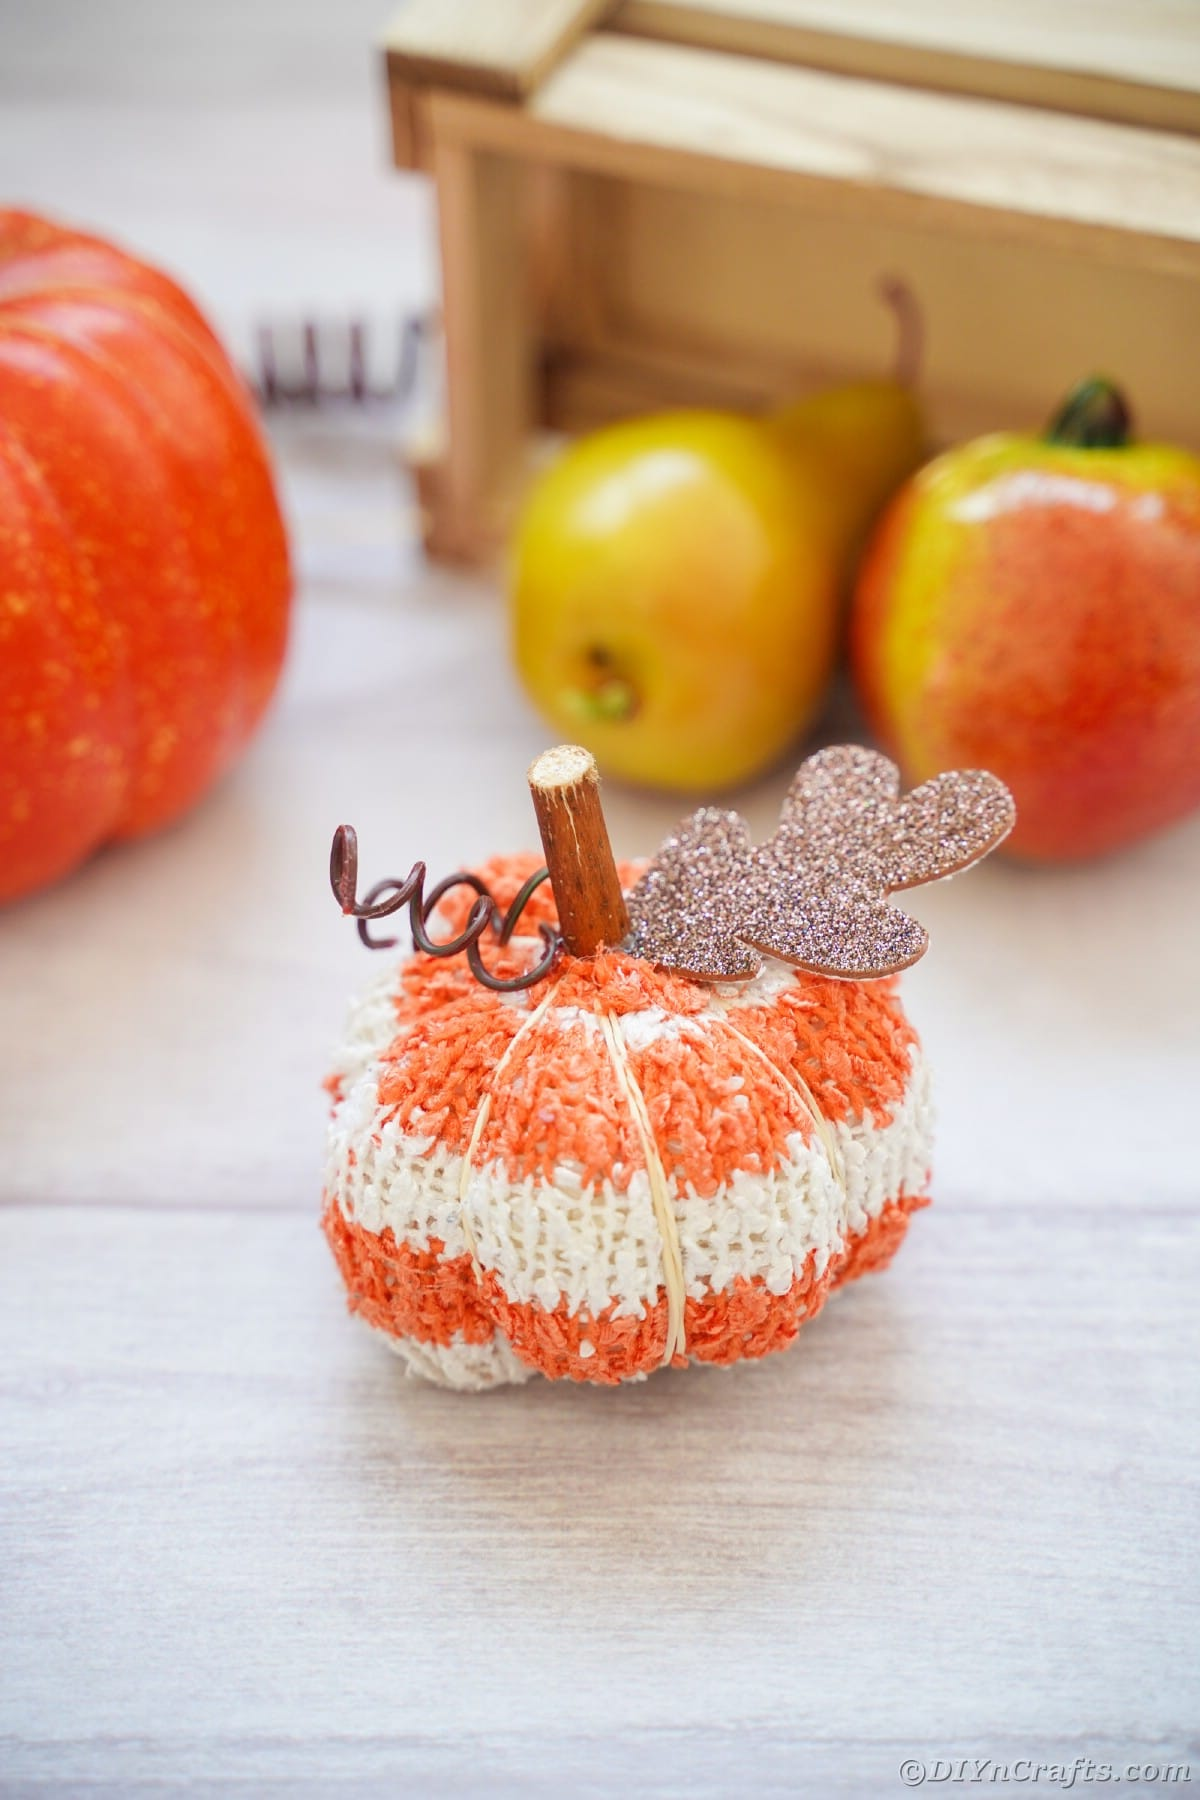 Abóbora de tecido listrado laranja e branco na mesa branca